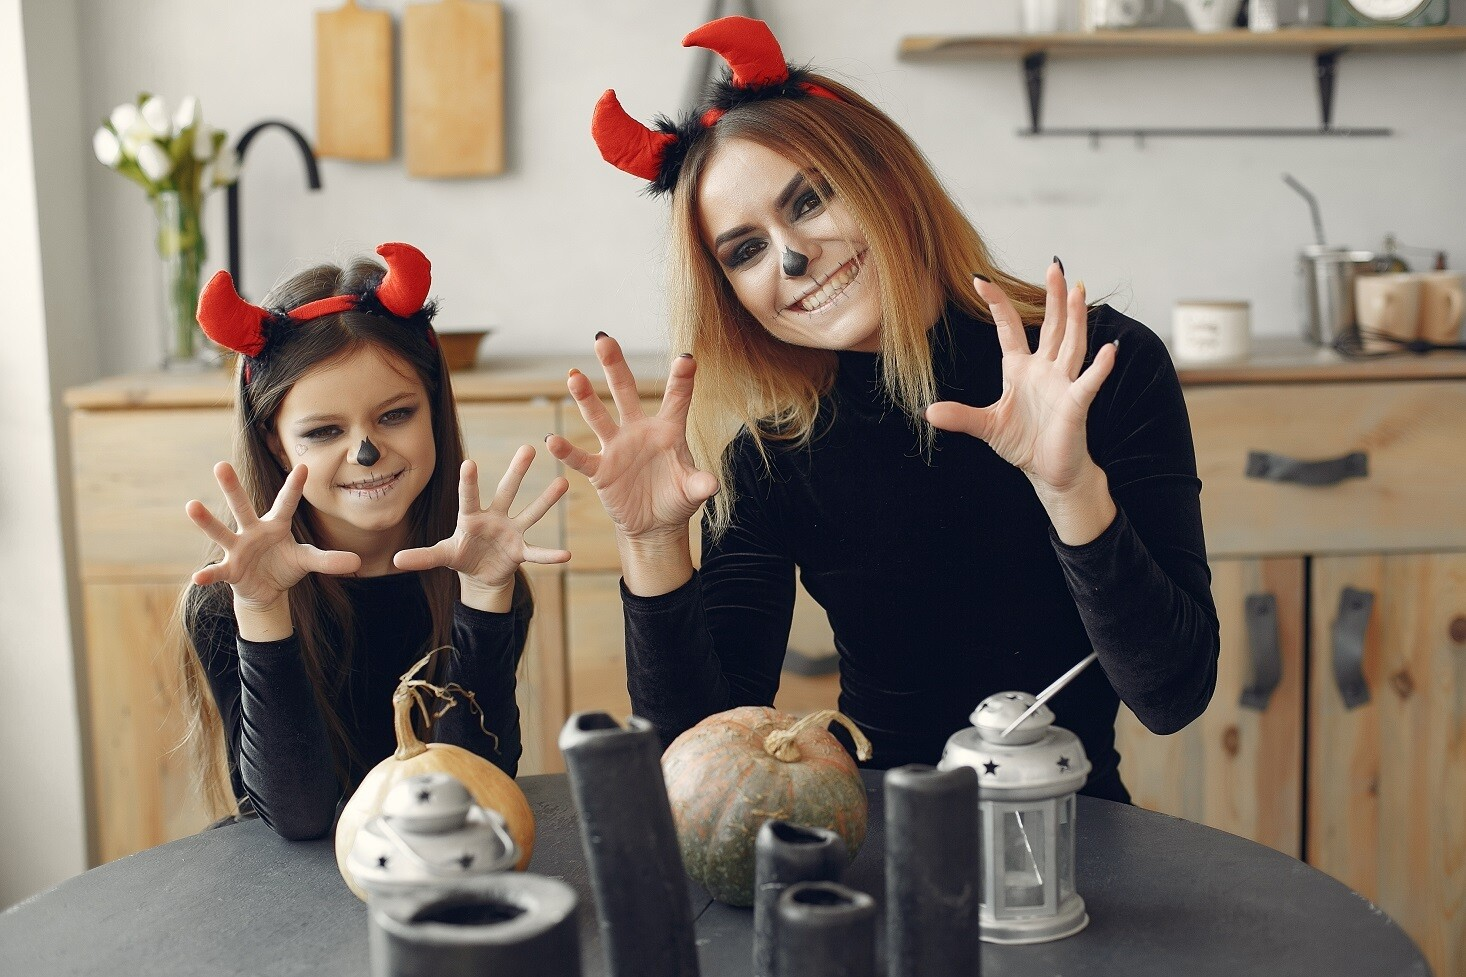 Live Online Virtual Party Makeup for Kids & Teens - Makeup Children Lesson